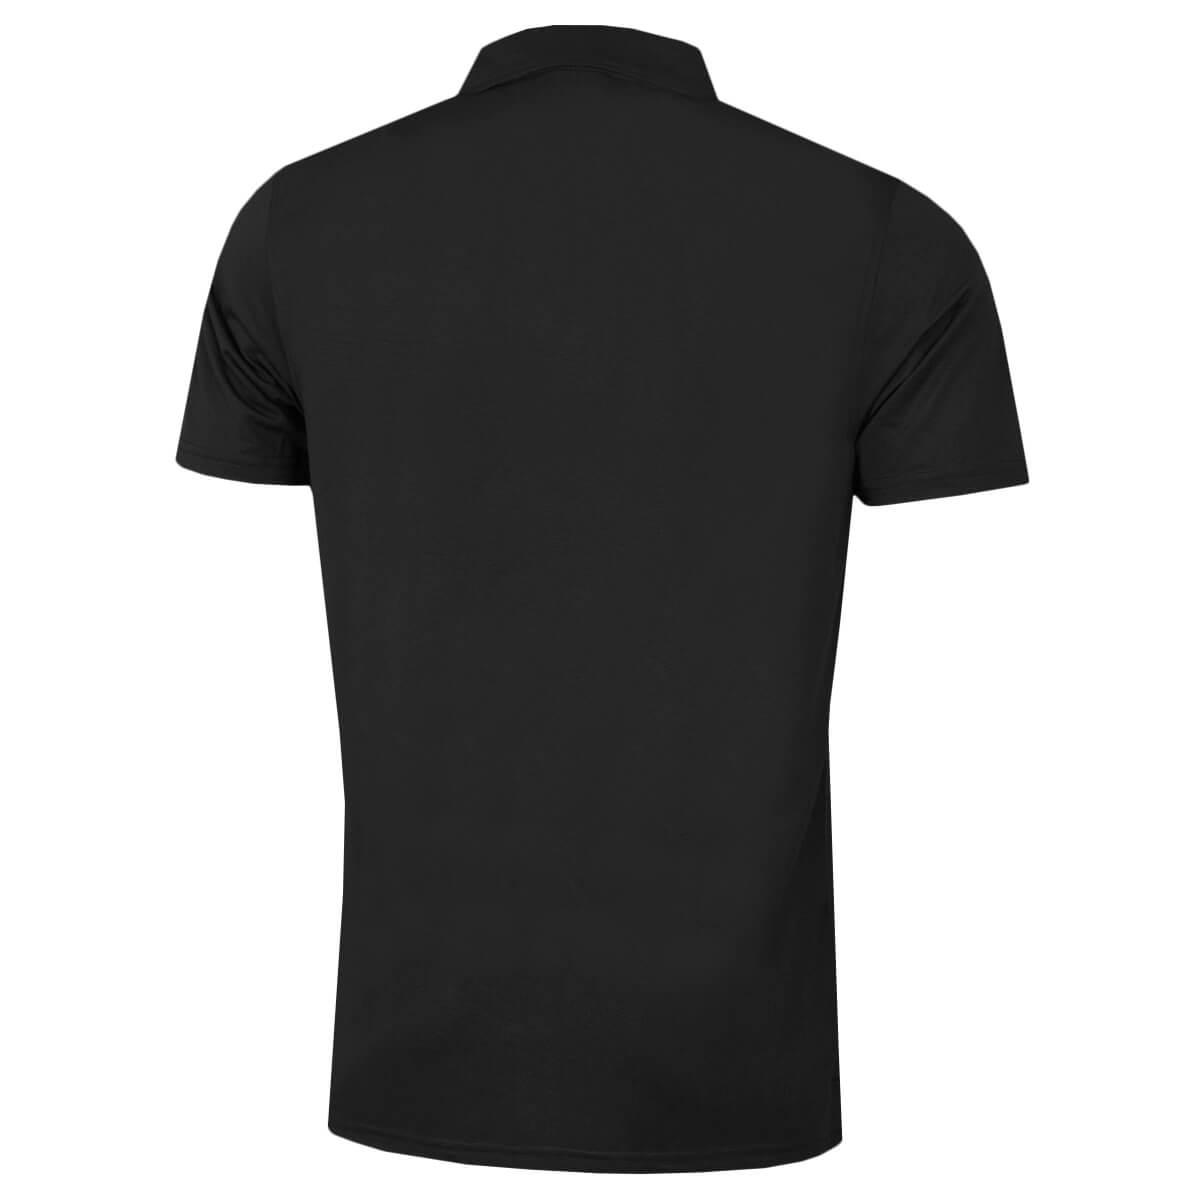 thumbnail 3 - Calvin Klein Mens 2021 Central Eco Light Wicking Golf Polo Shirt 28% OFF RRP